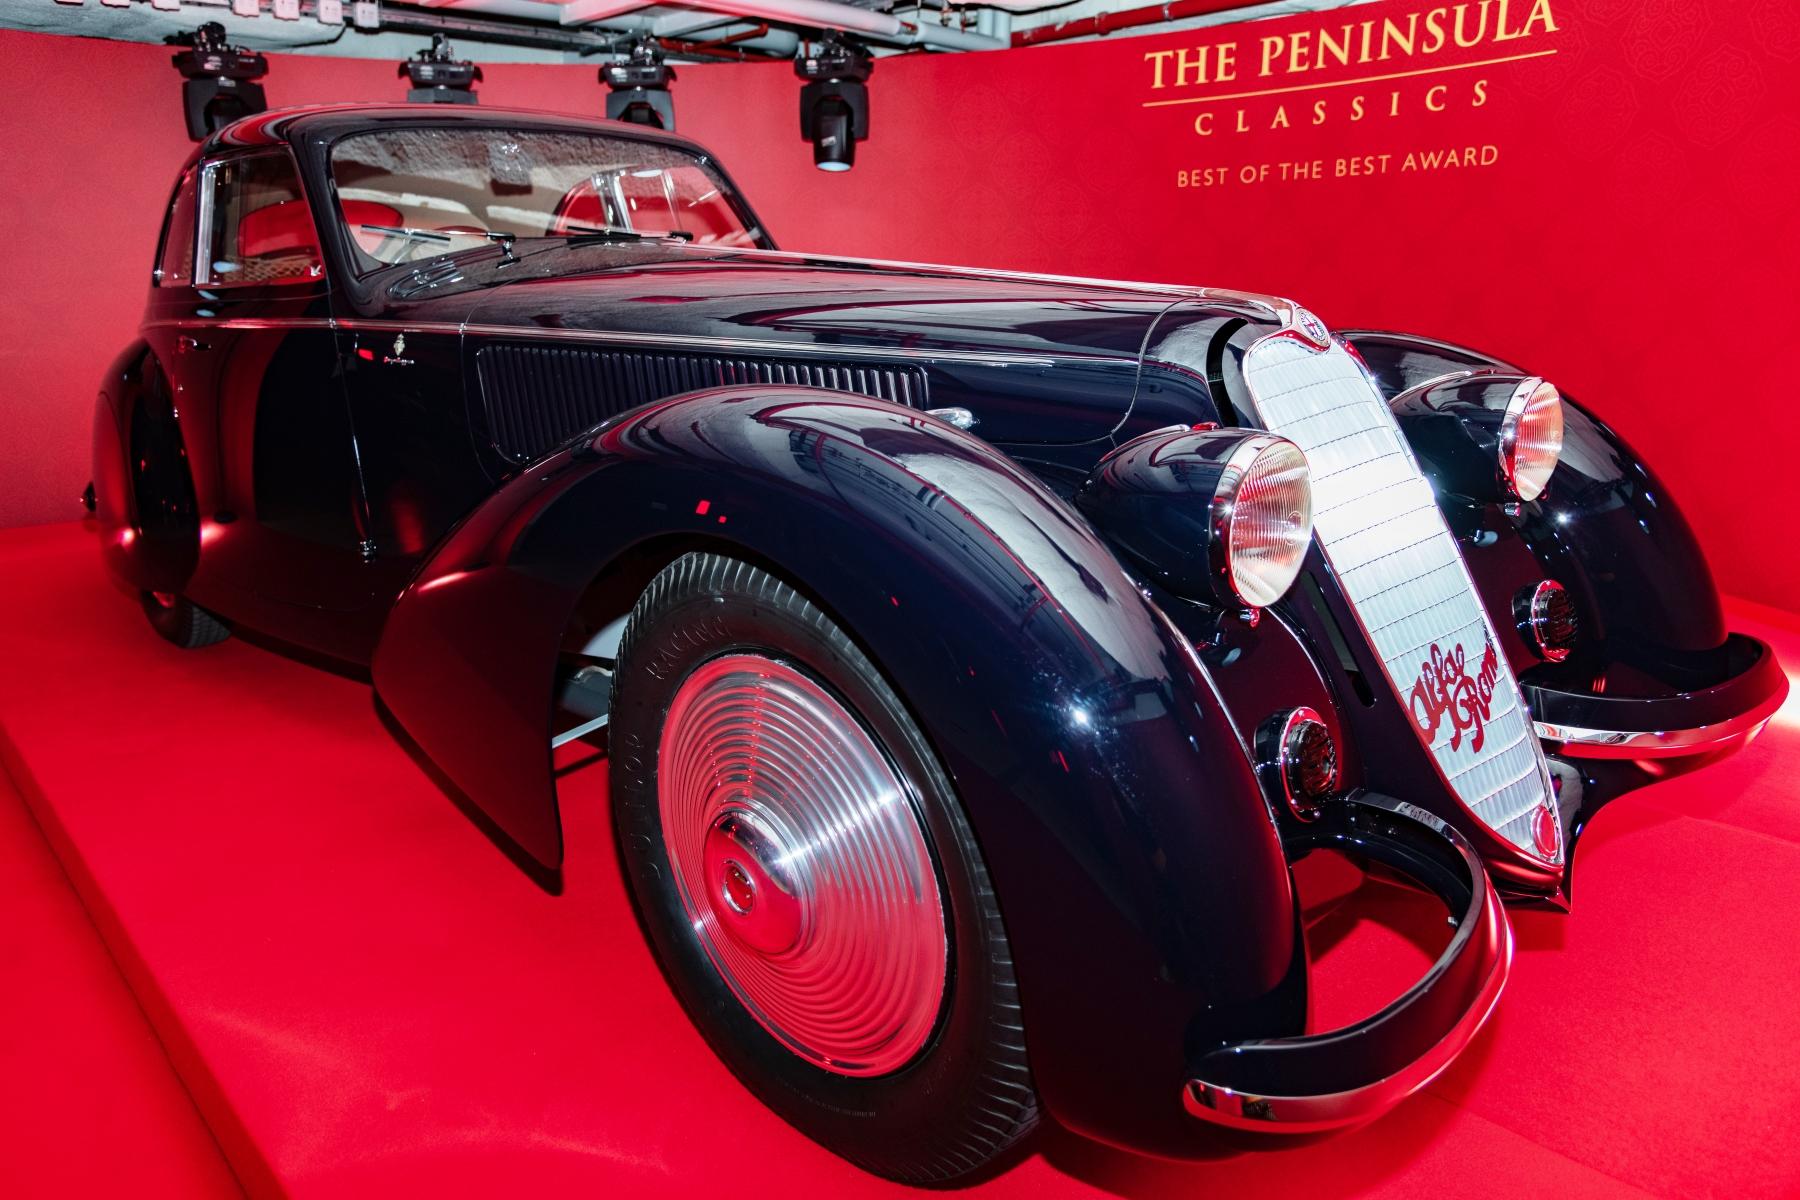 Photo credit @janacallmej 1937 ALFA ROMEO 8C 2900B BERLINETTA named winner of The Peninsula Classics Best of the Best Award